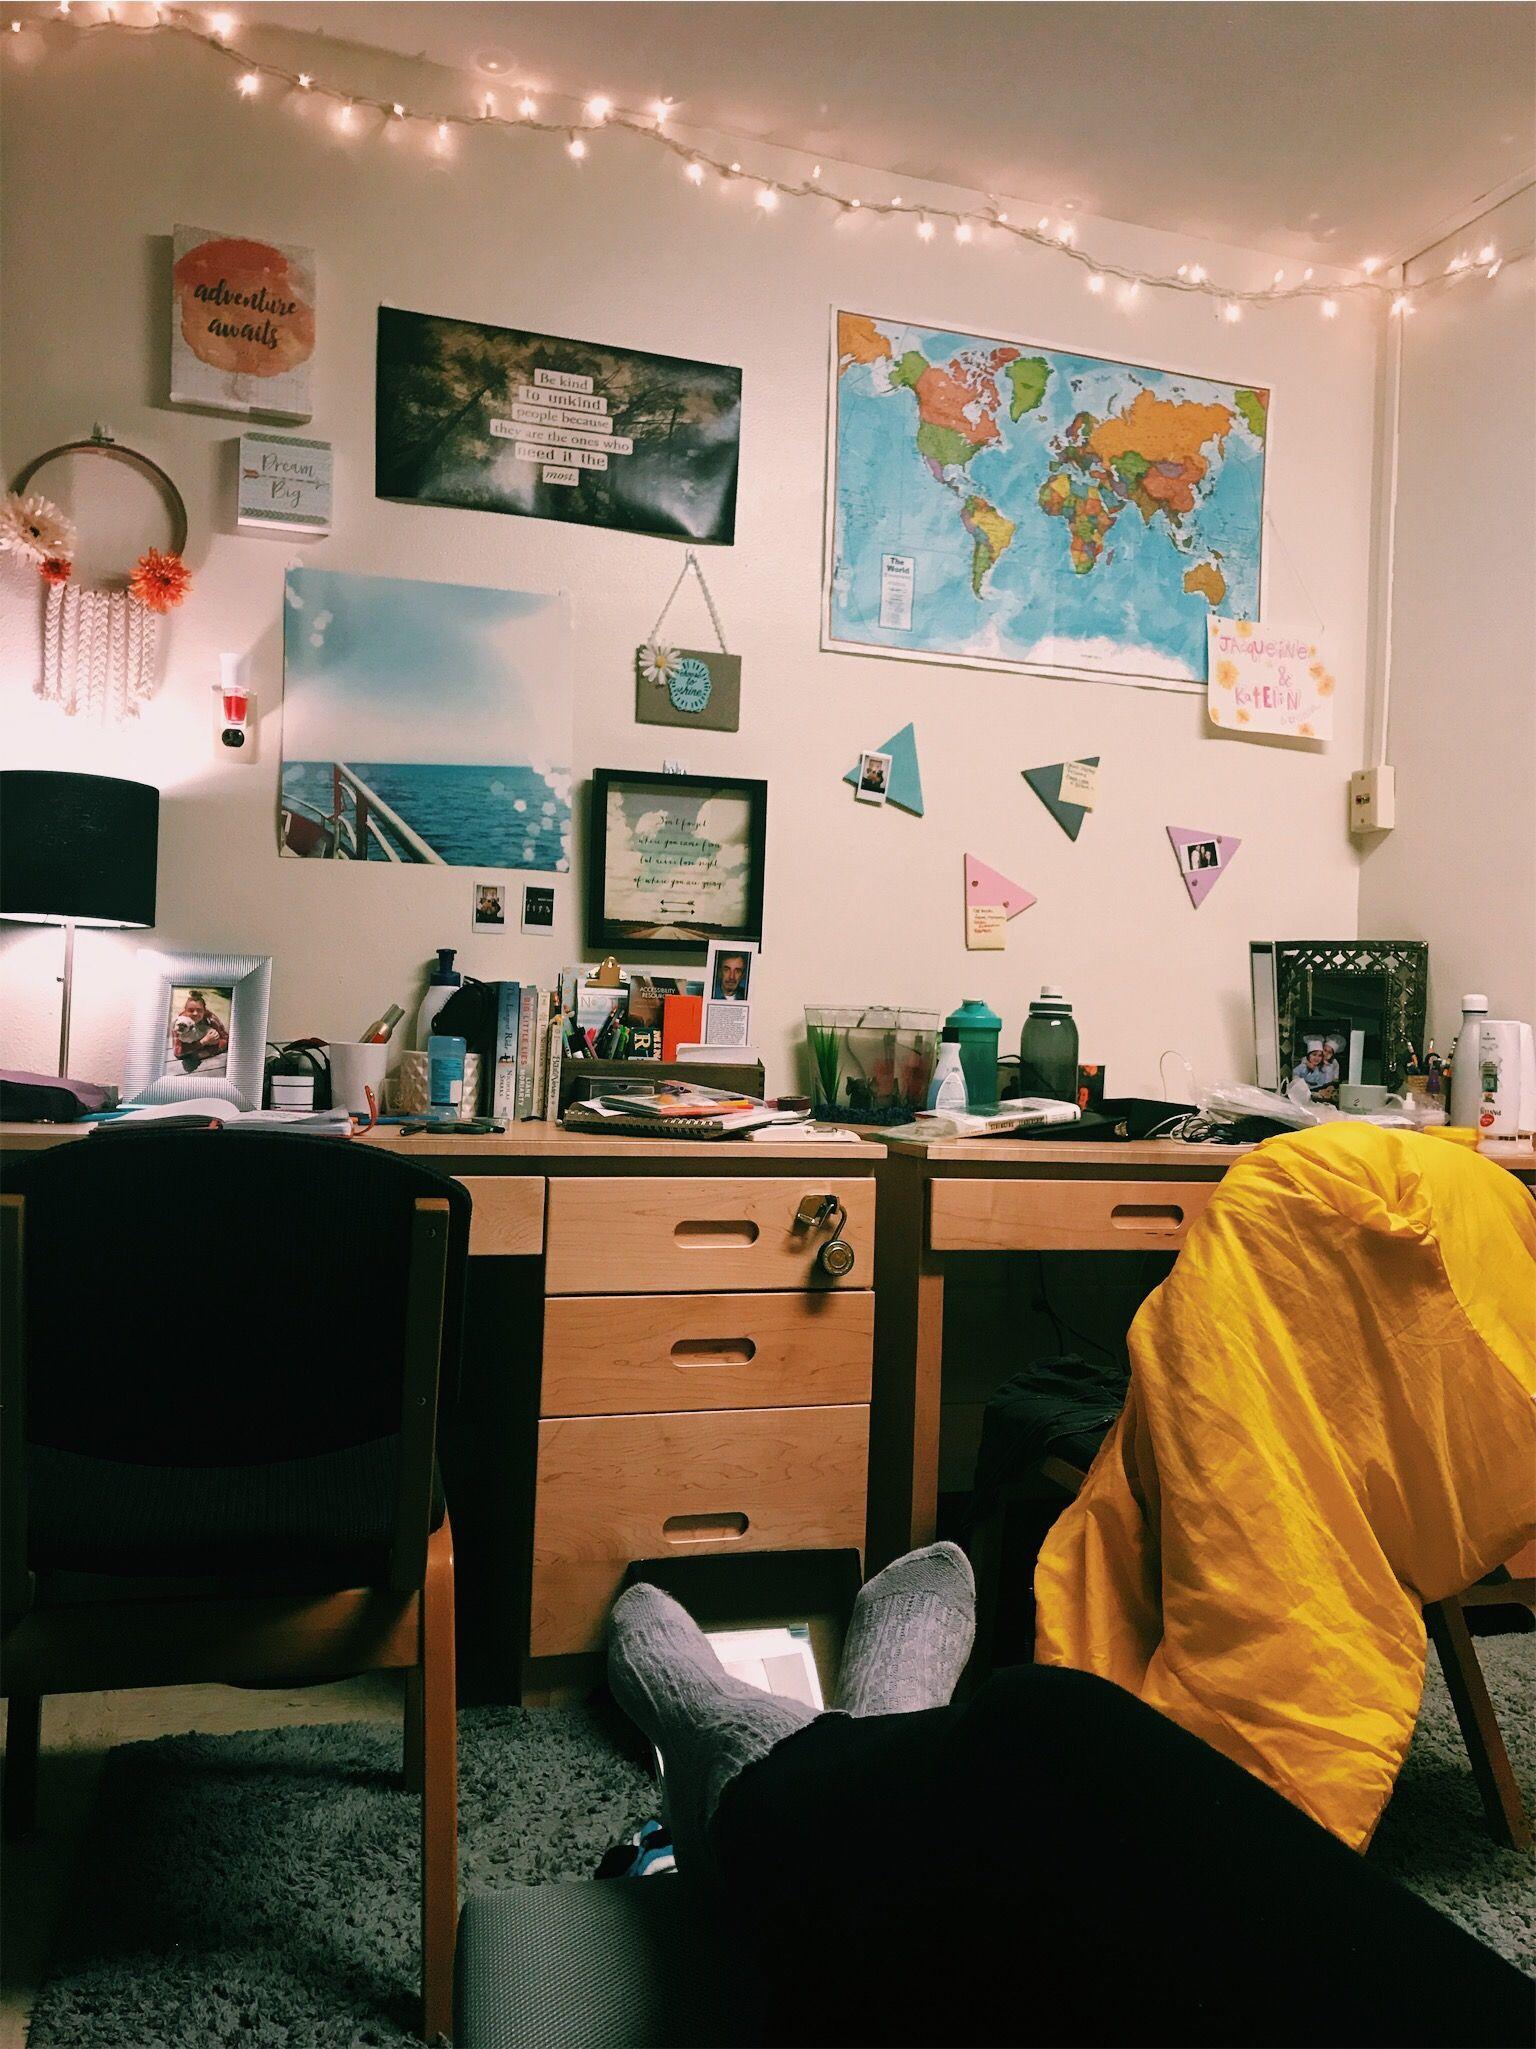 Aesthetic Dorm Room: Dorm Room Inspiration, Dorm Style